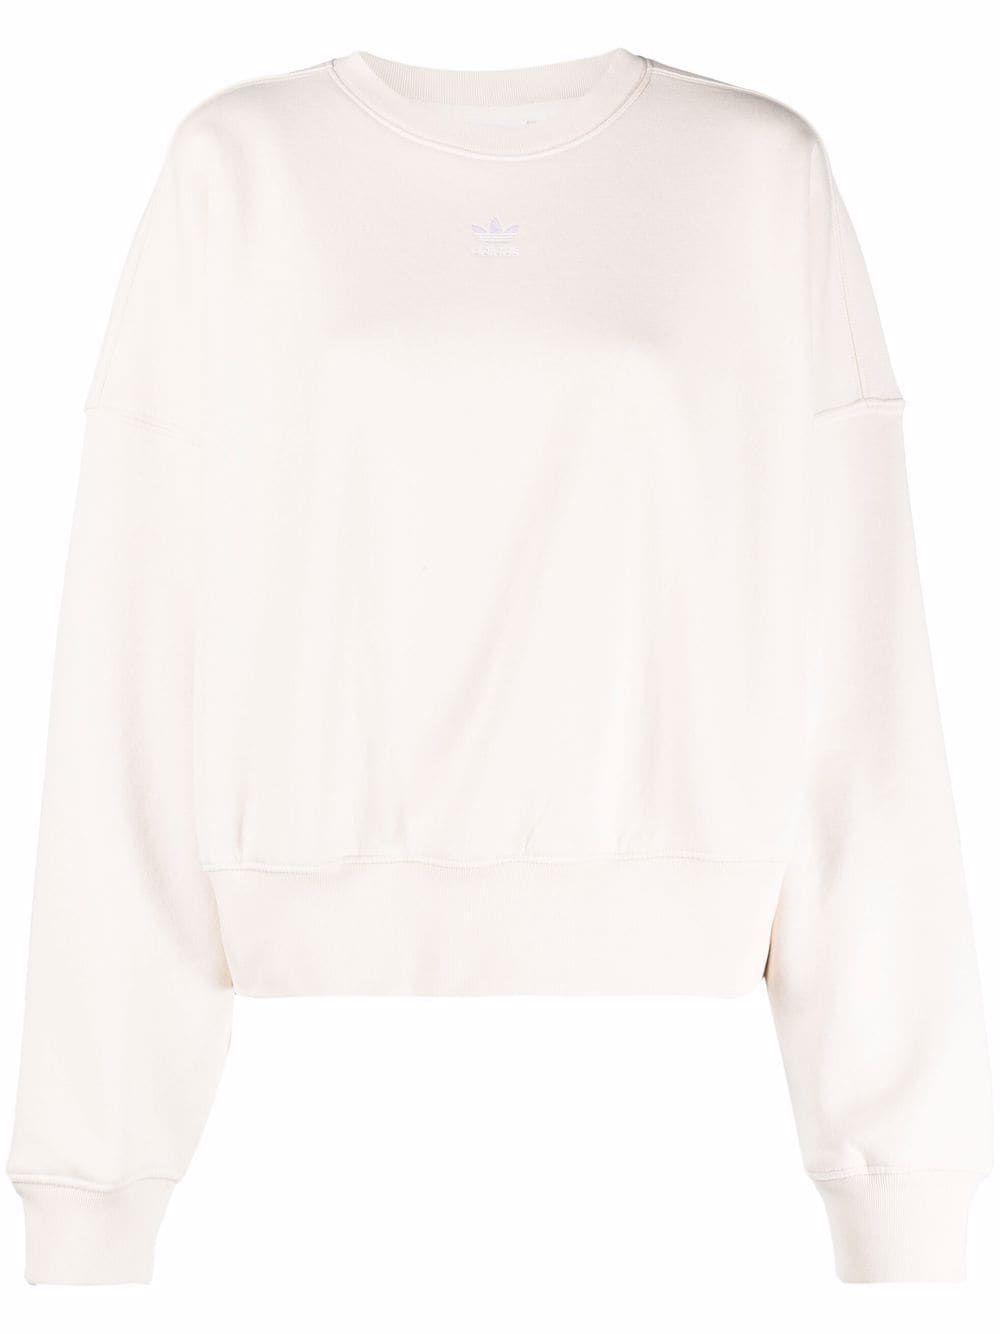 Adidas maglie bianco